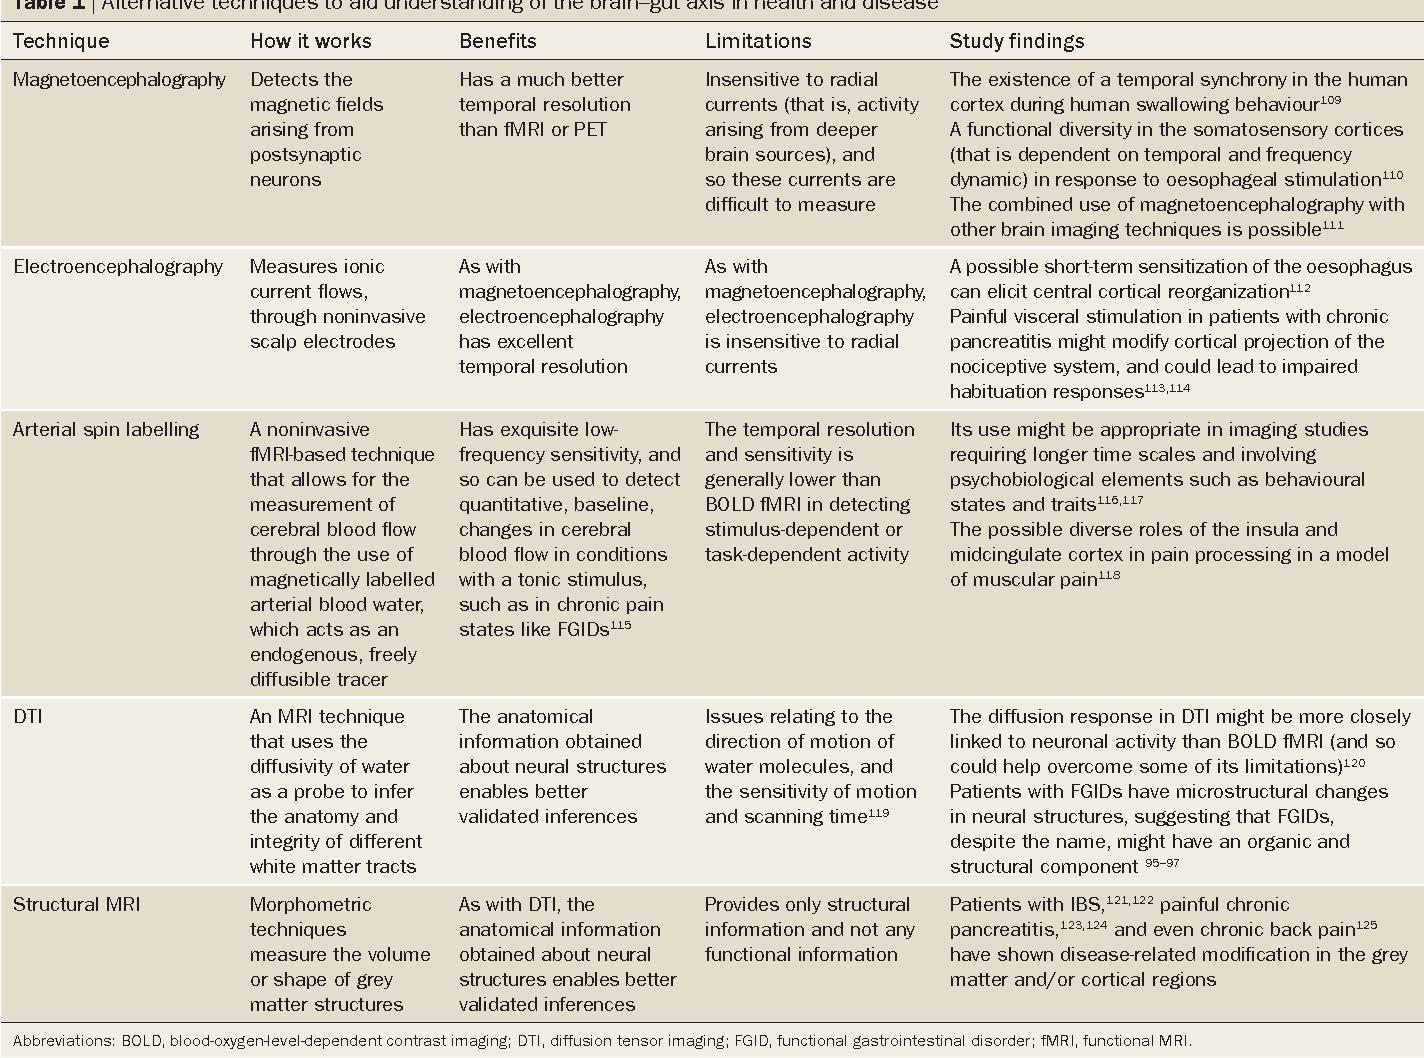 Functional brain imaging in gastroenterology: to new beginnings